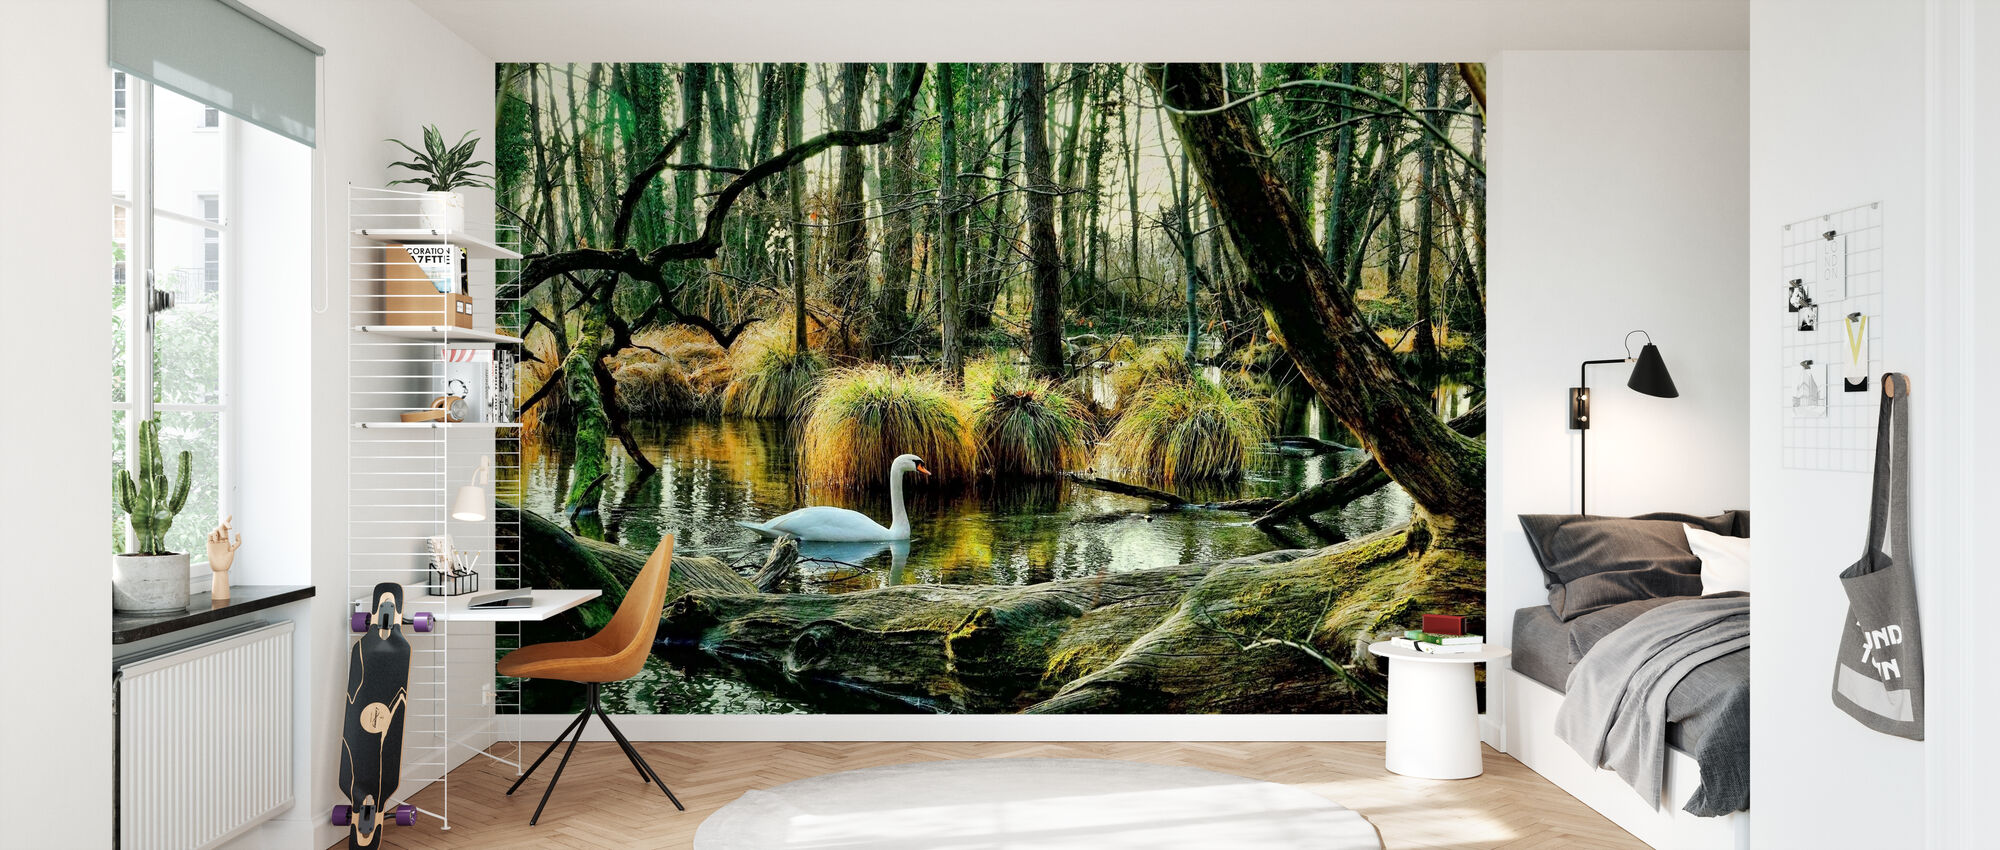 Swan in Swamp - Wallpaper - Kids Room